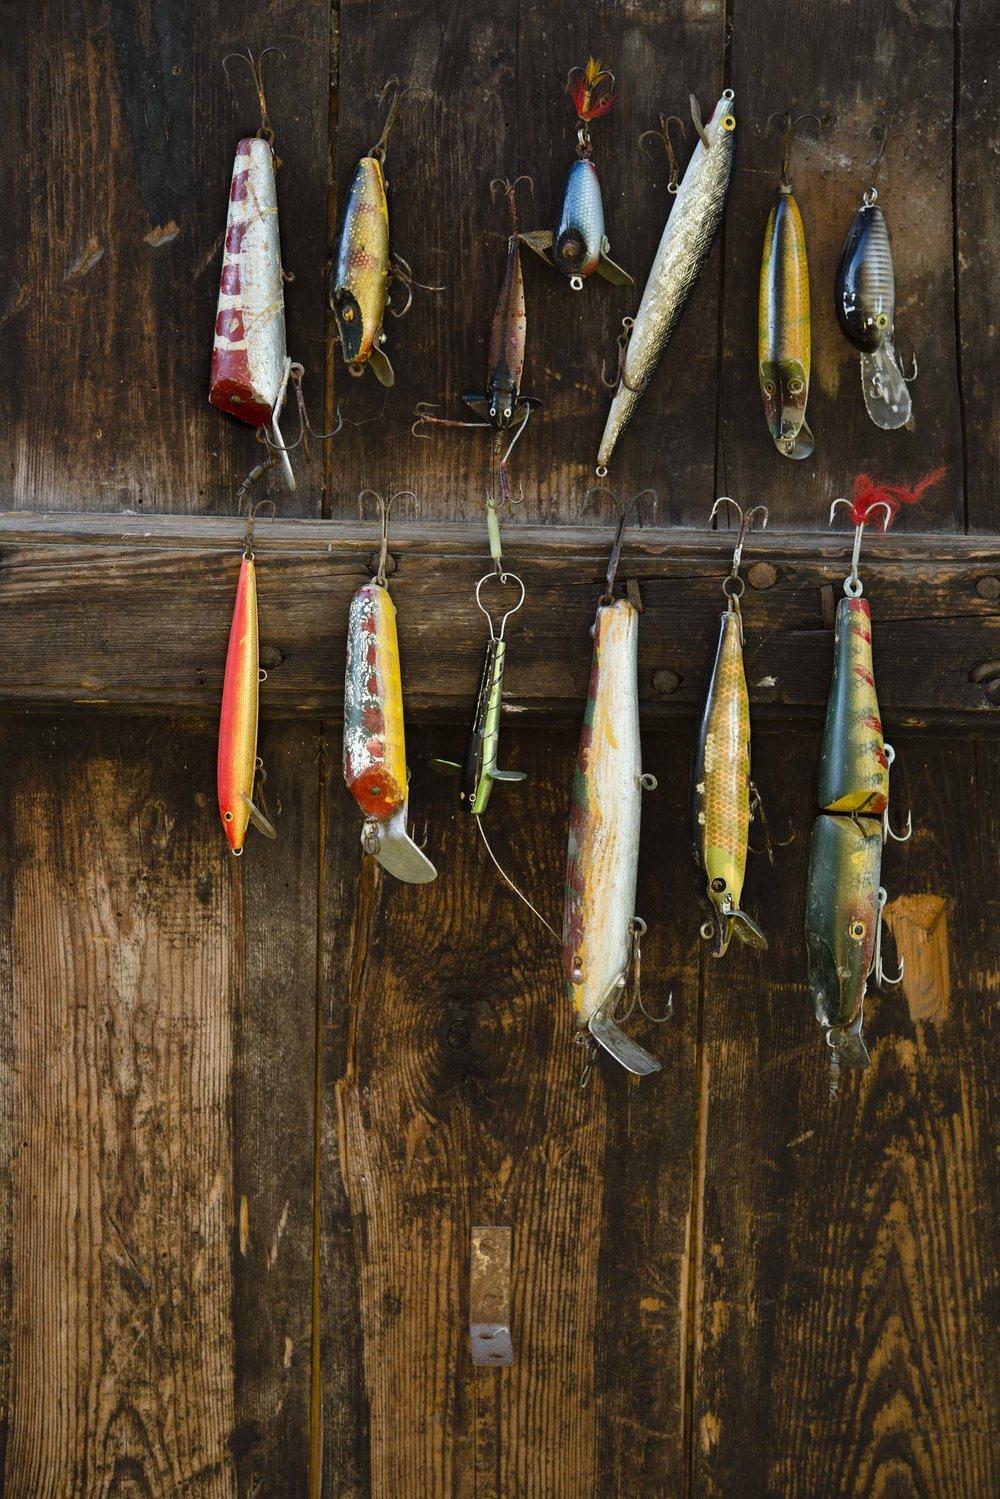 Sjoorret-fiske-97278.jpg